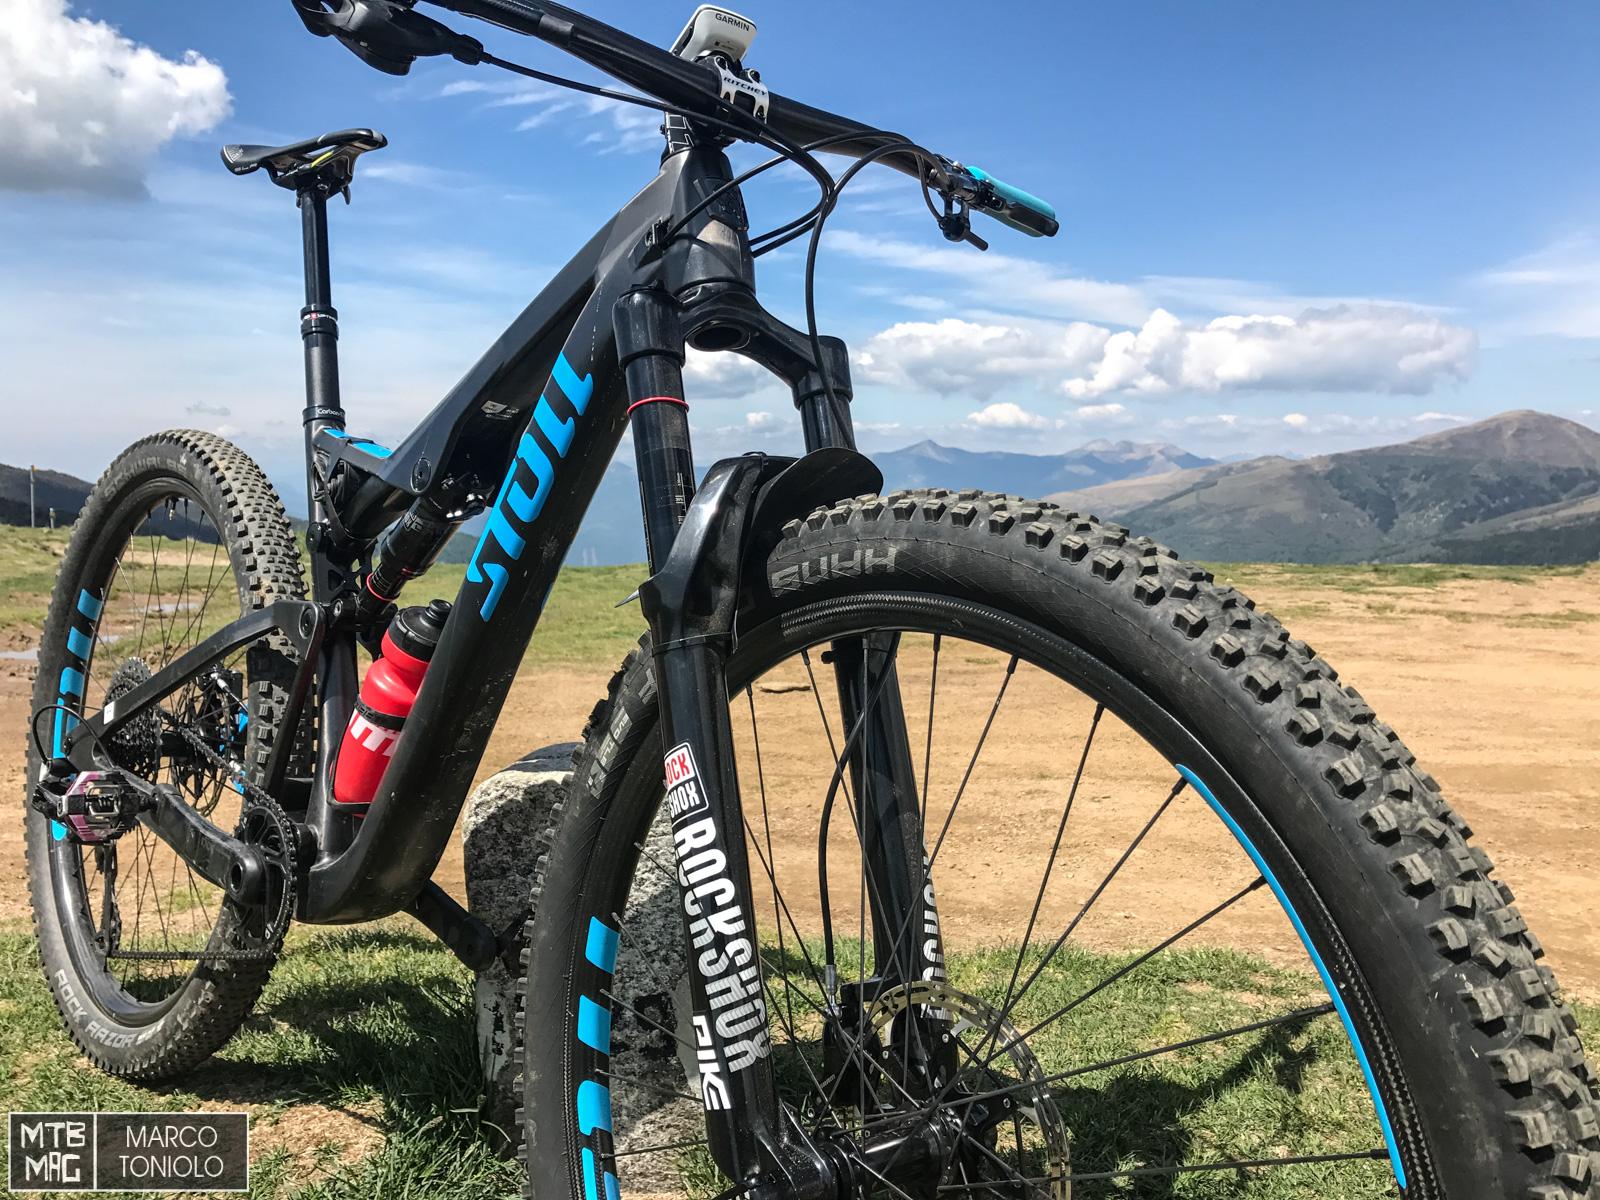 MTB-MAG COM - Mountain Bike Magazine | RockShox Pike: new vs old